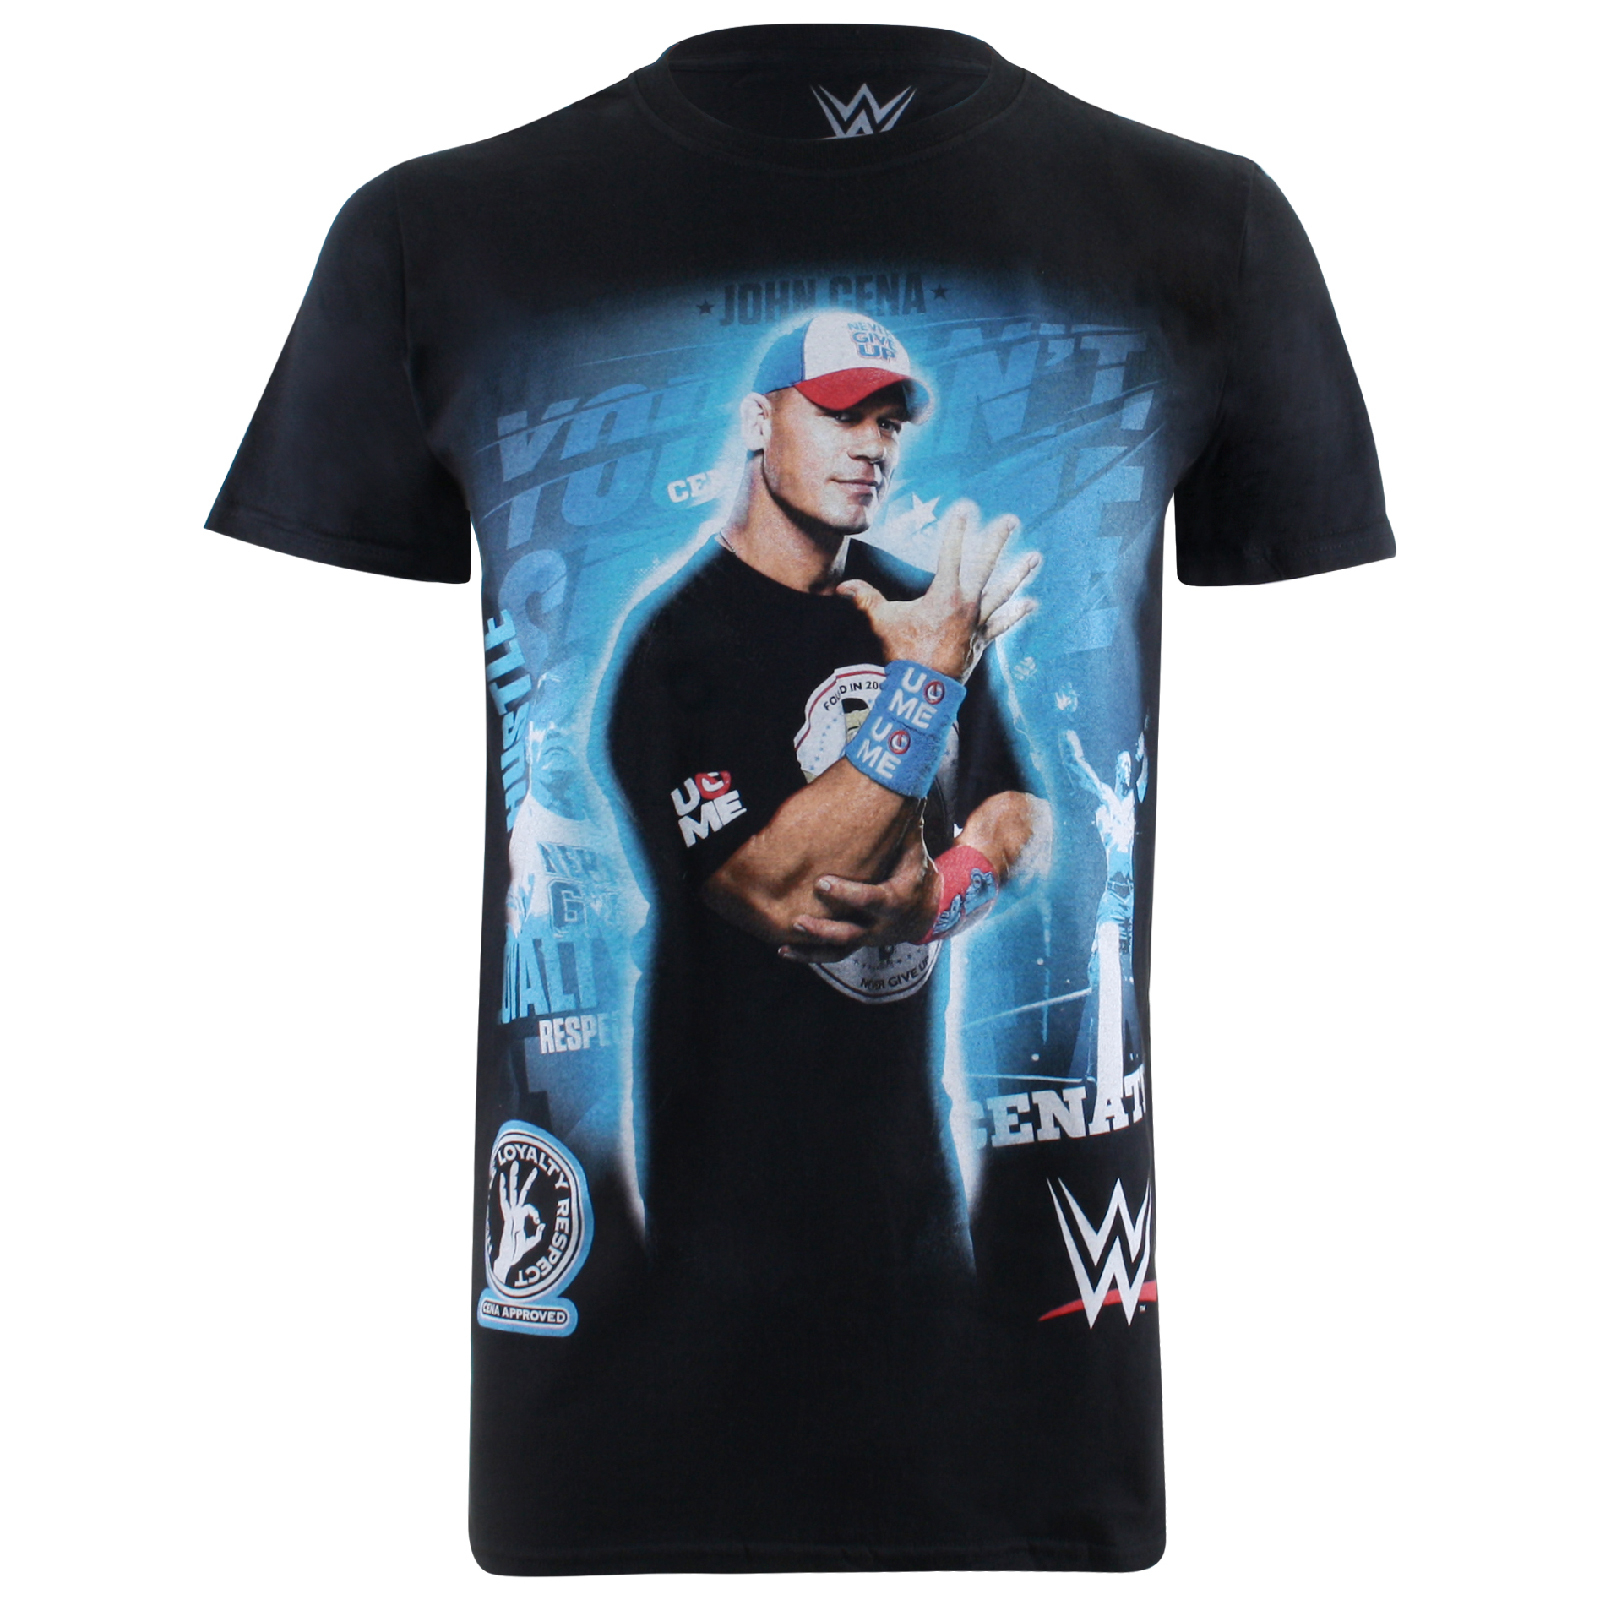 966f23a20 Camiseta WWE